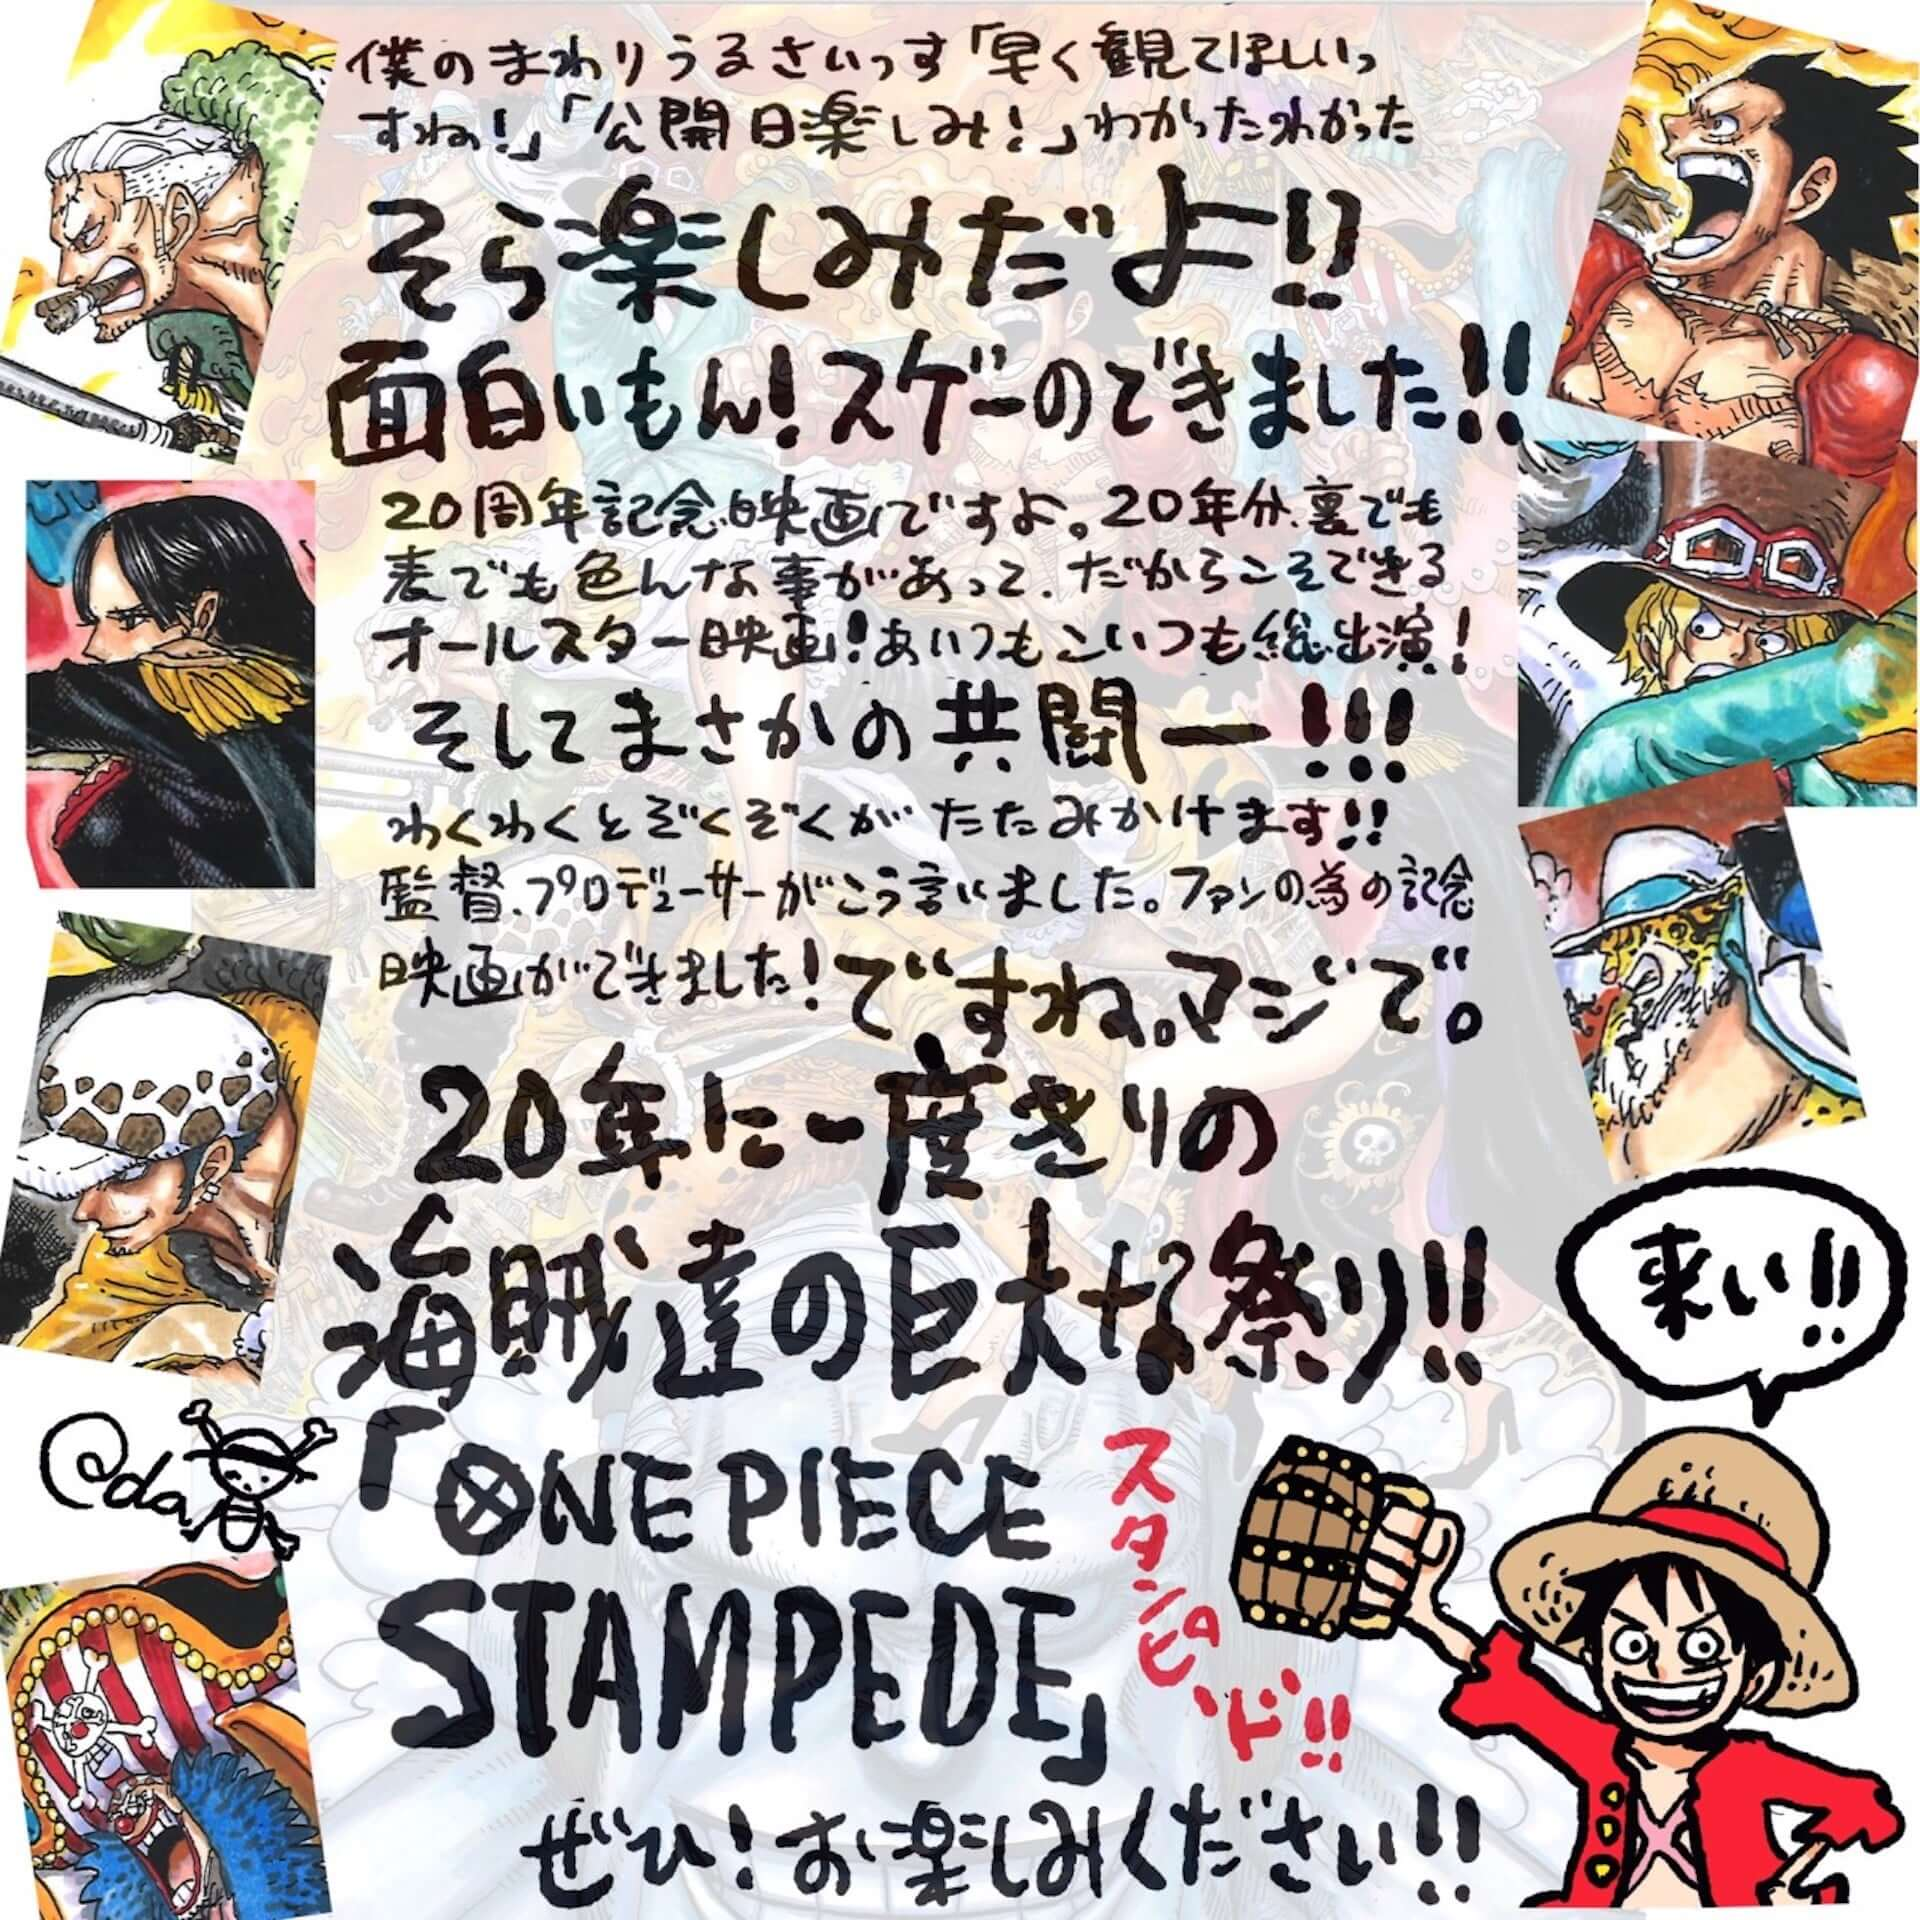 『ONE PIECE』原作者・尾田栄一郎直筆メッセージが到着!劇場版『ONE PIECE STAMPEDE』明日公開 film190808_onepiece_stampede_oda_main-1920x1920